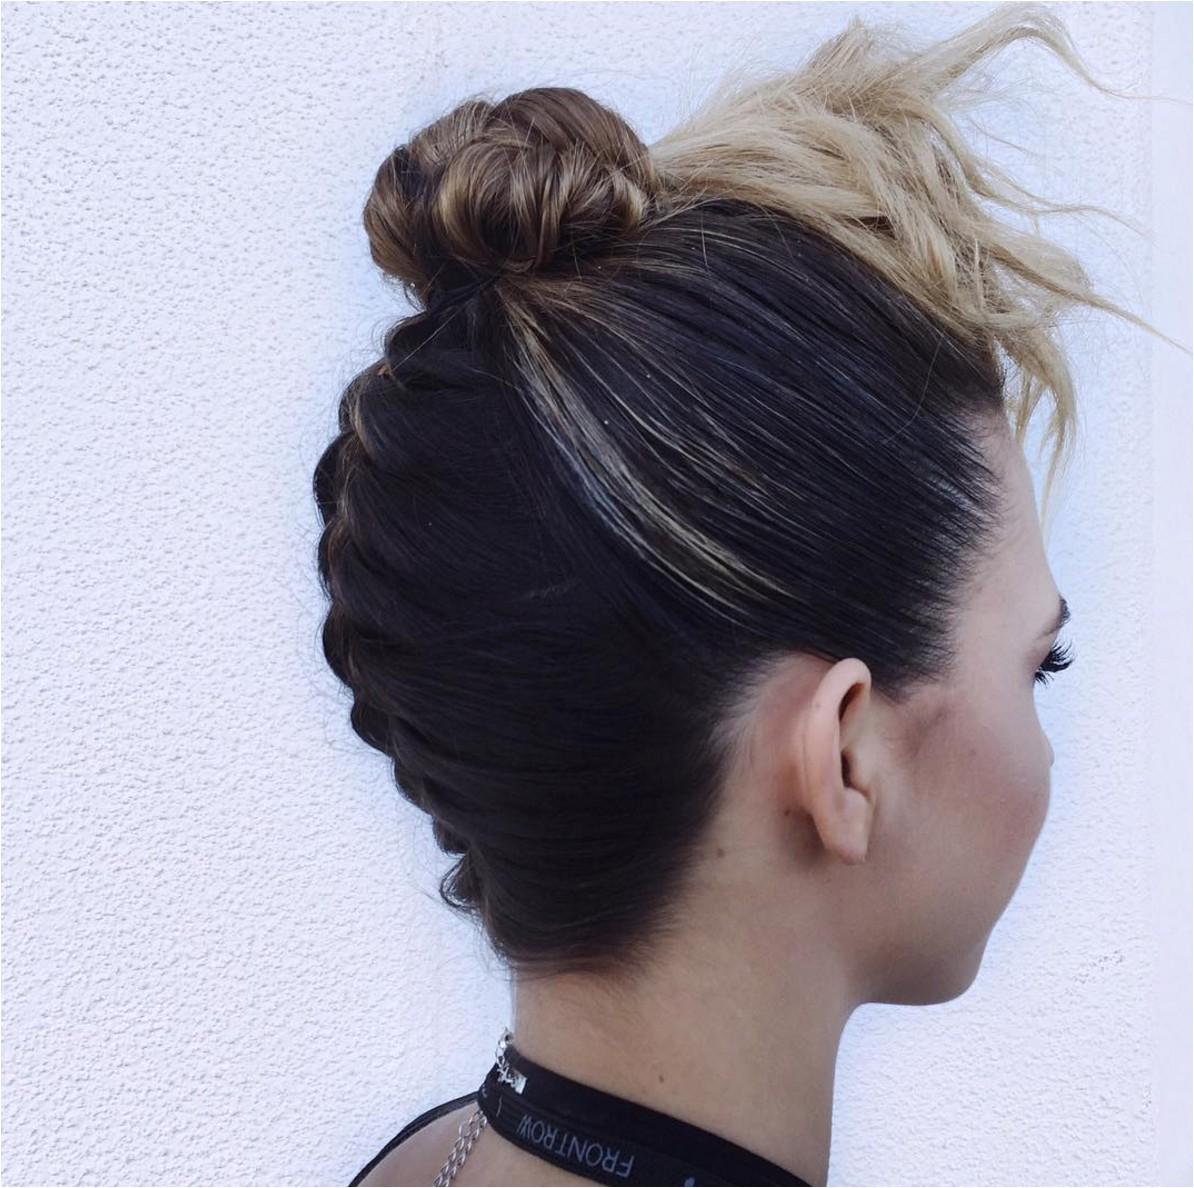 French Braid with Bun Hairstyles Hair by Jessica Ryland Upside Down French Braid Bun Faux Bangs